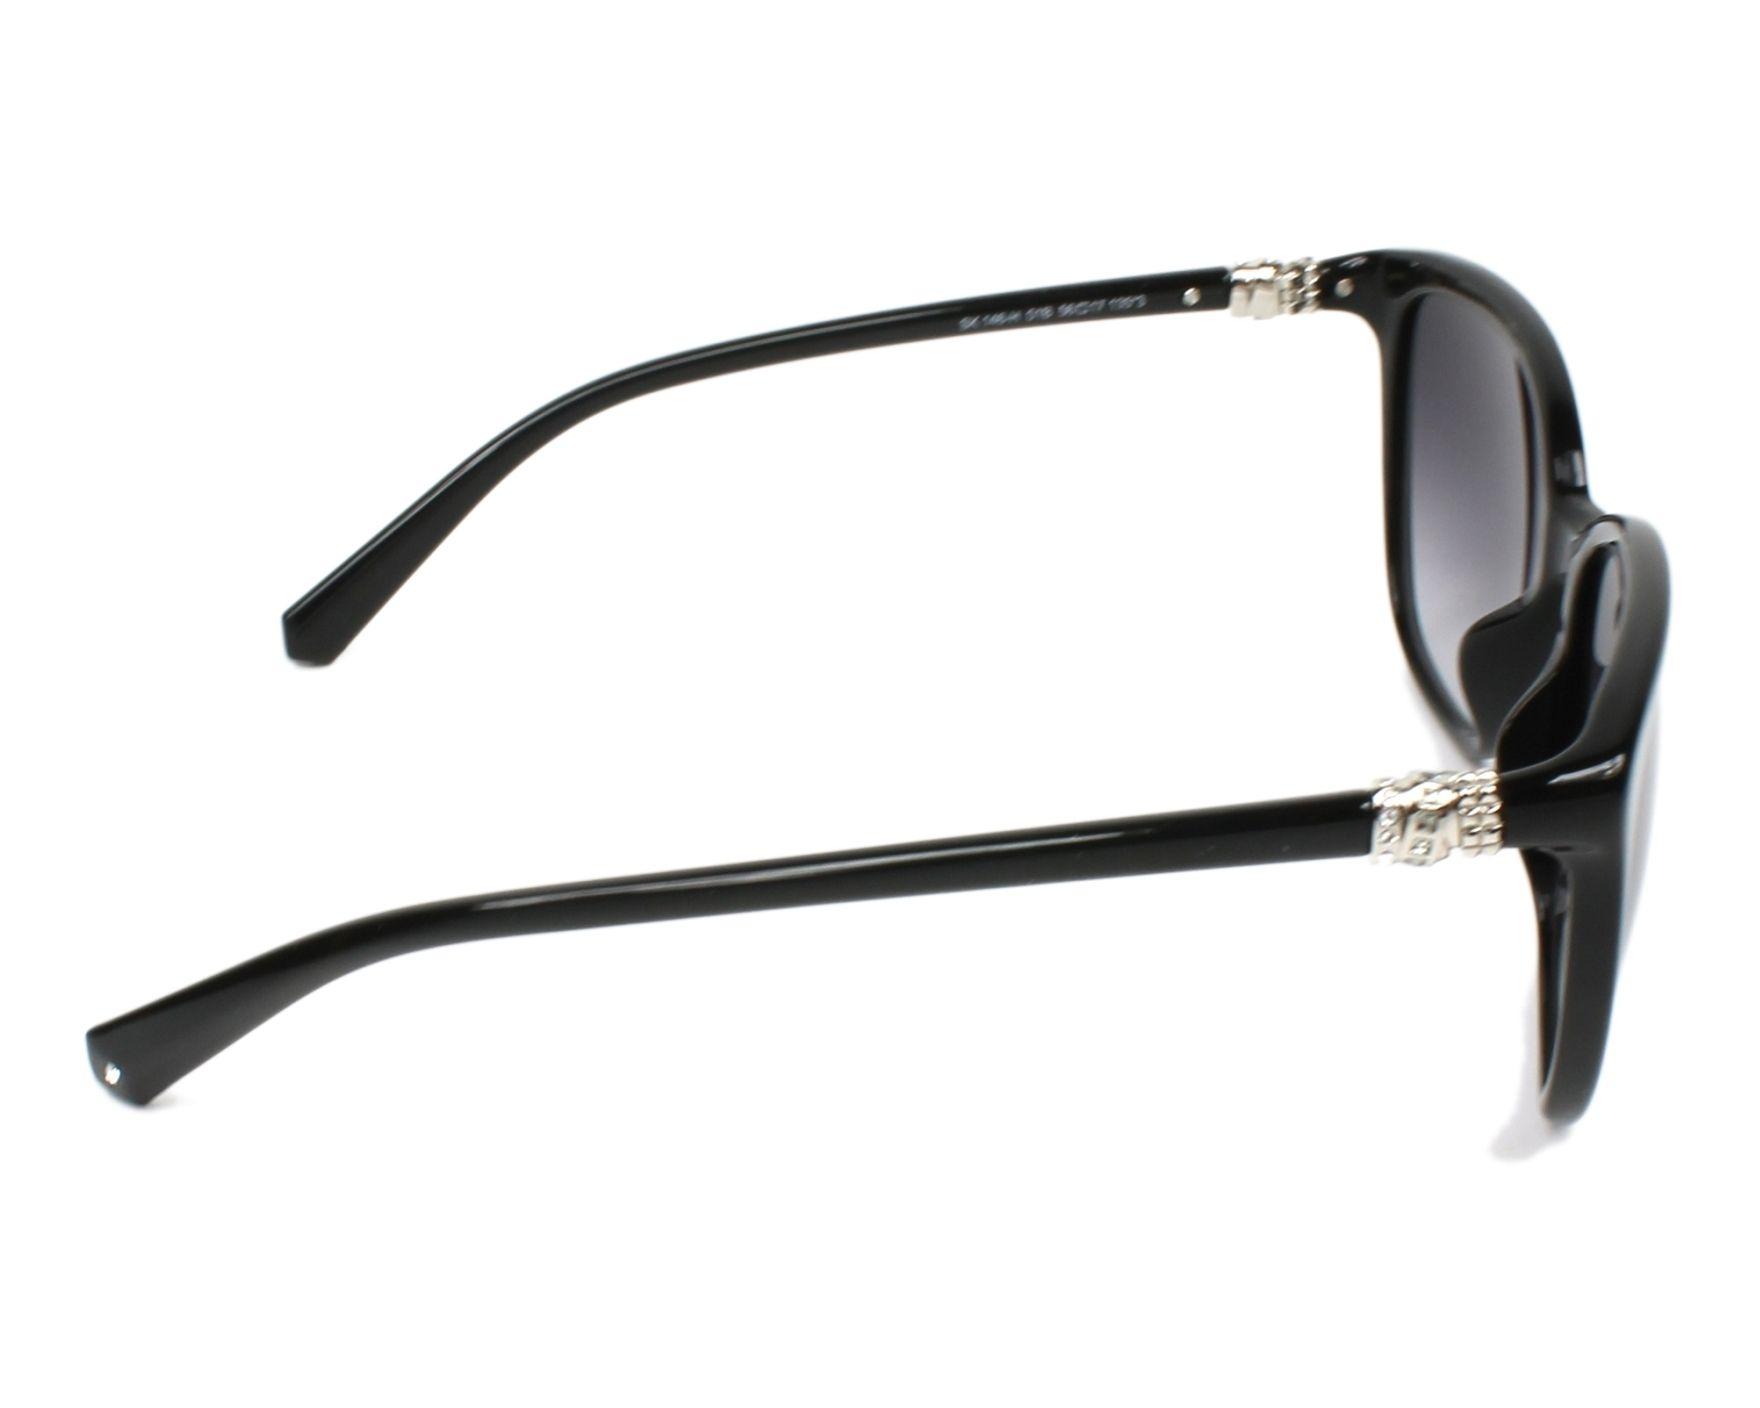 c732fed1ec Gafas de sol Swarovski SK-0146-H 01B 56-17 Negra vista lateral